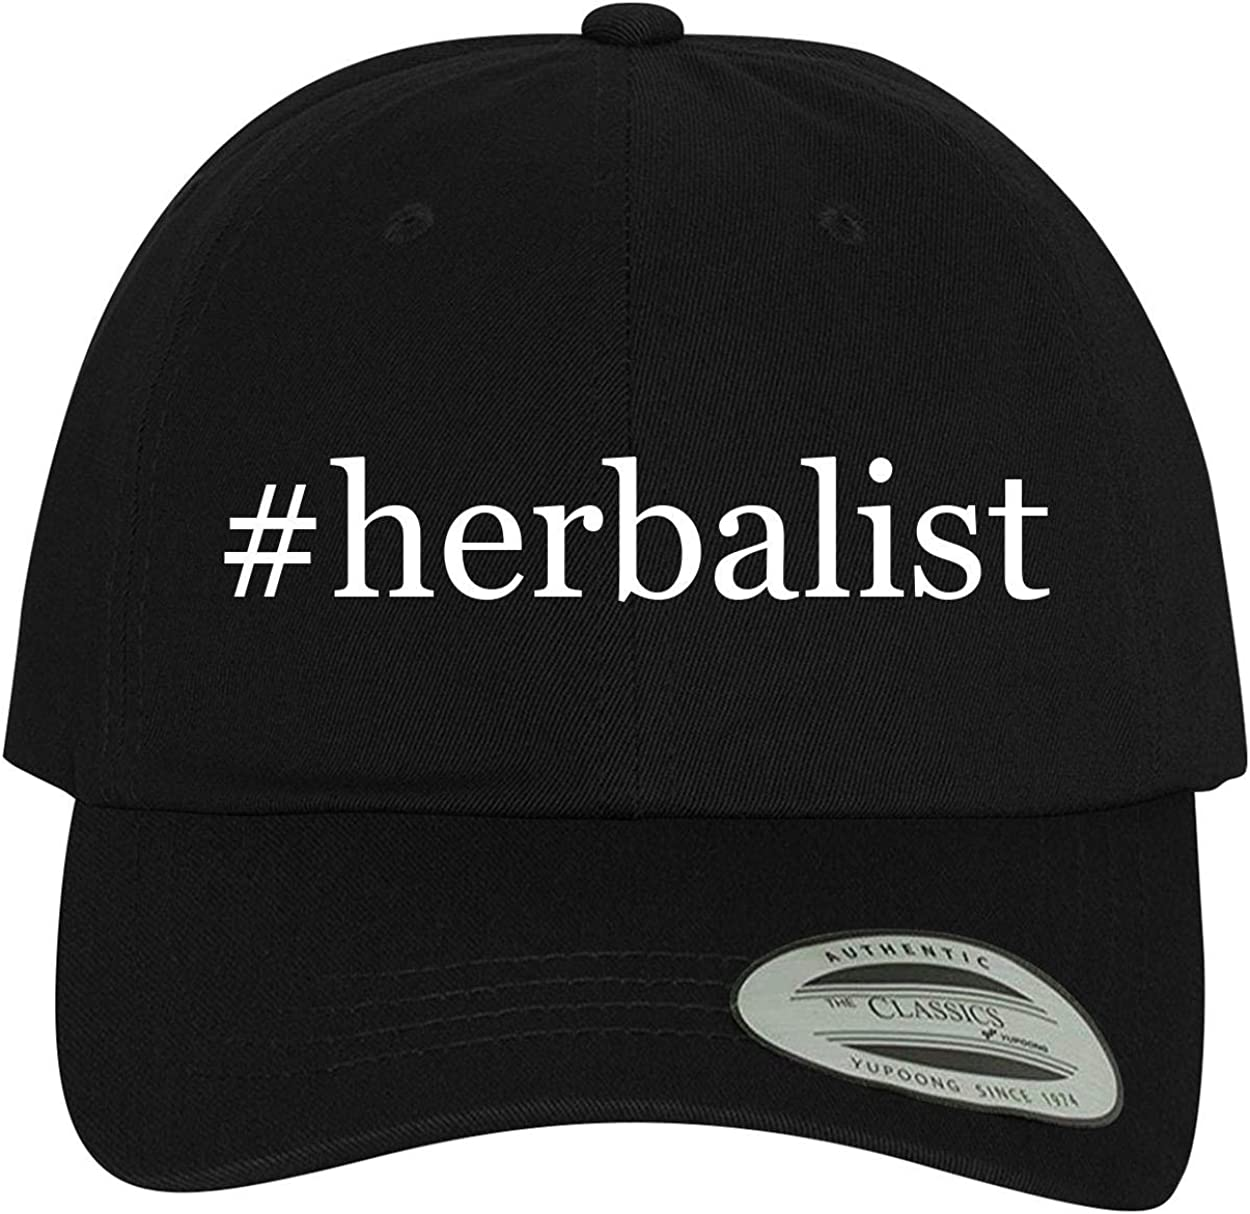 BH Cool Designs #Herbalist Comfortable Dad Hat Baseball Cap